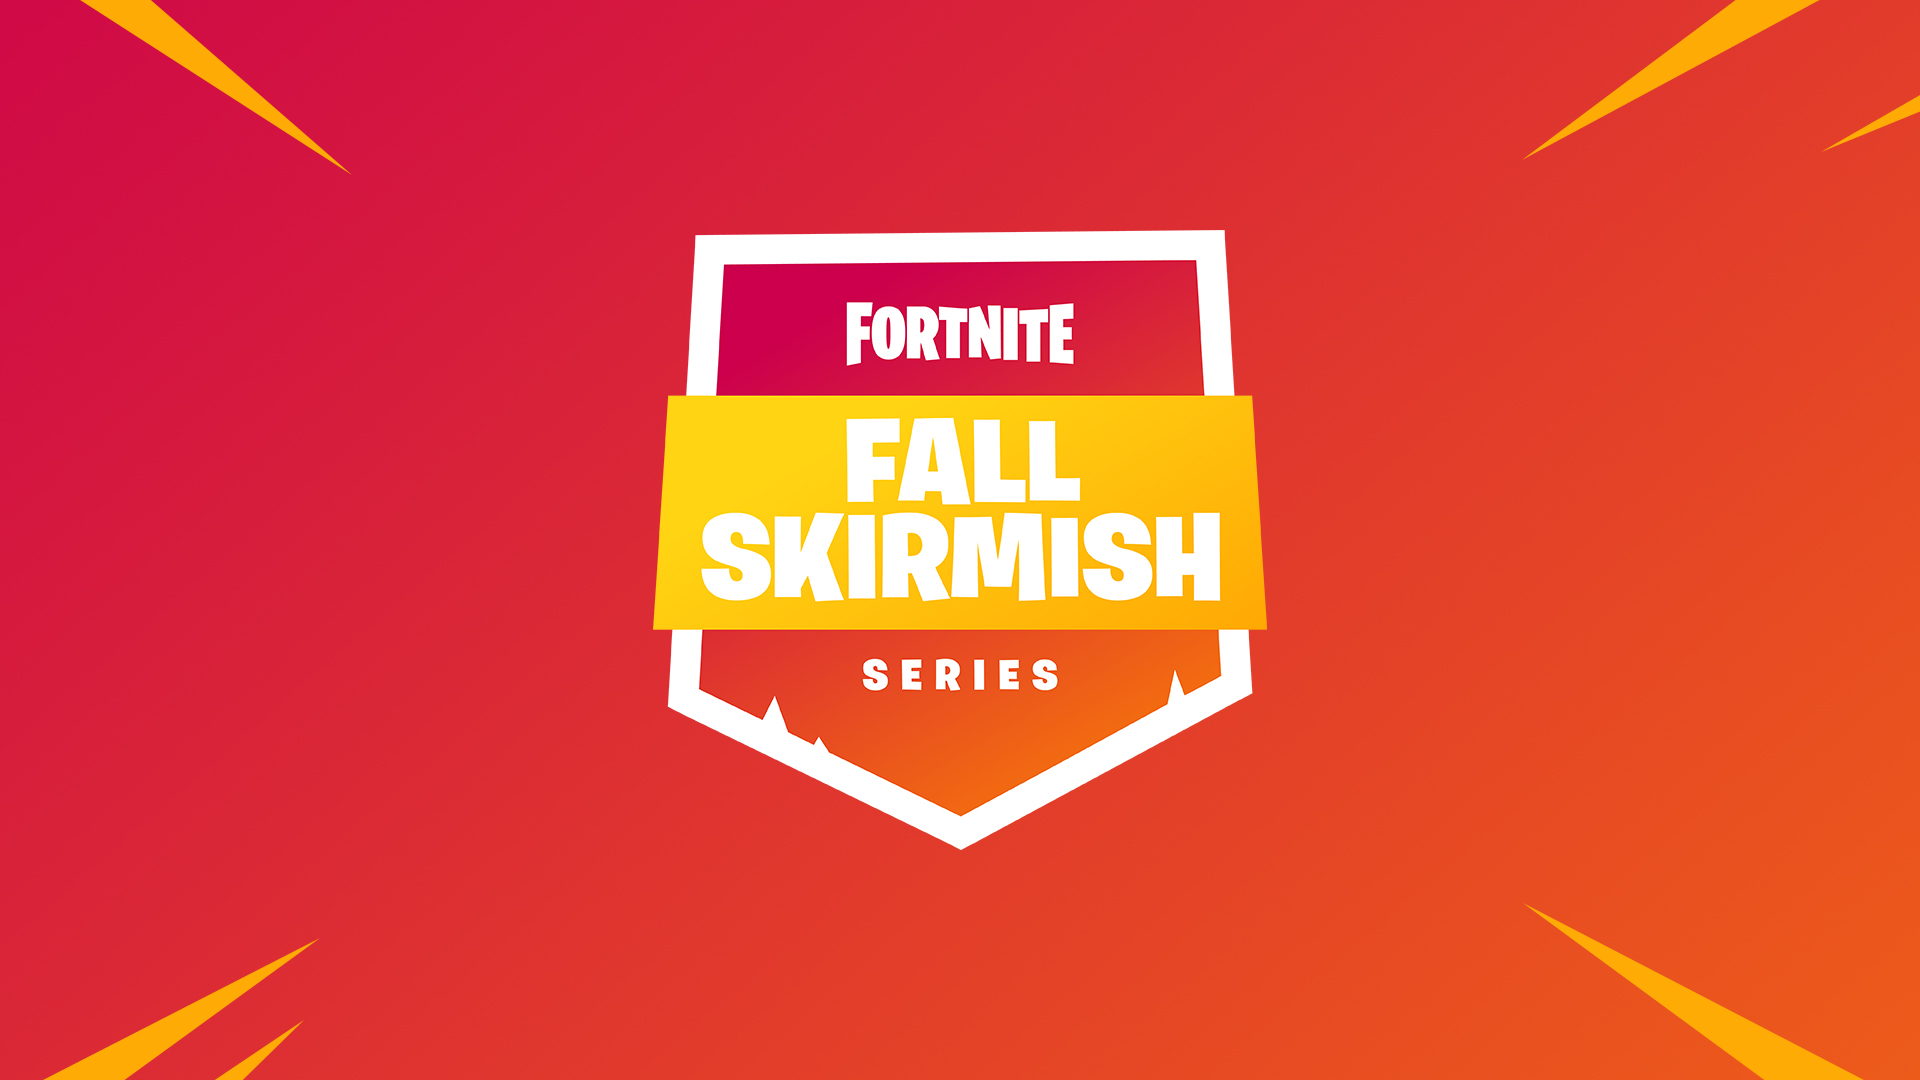 Fortnite Skirmish Peripherals Fall Skirmish Twitchcon 2018 Details